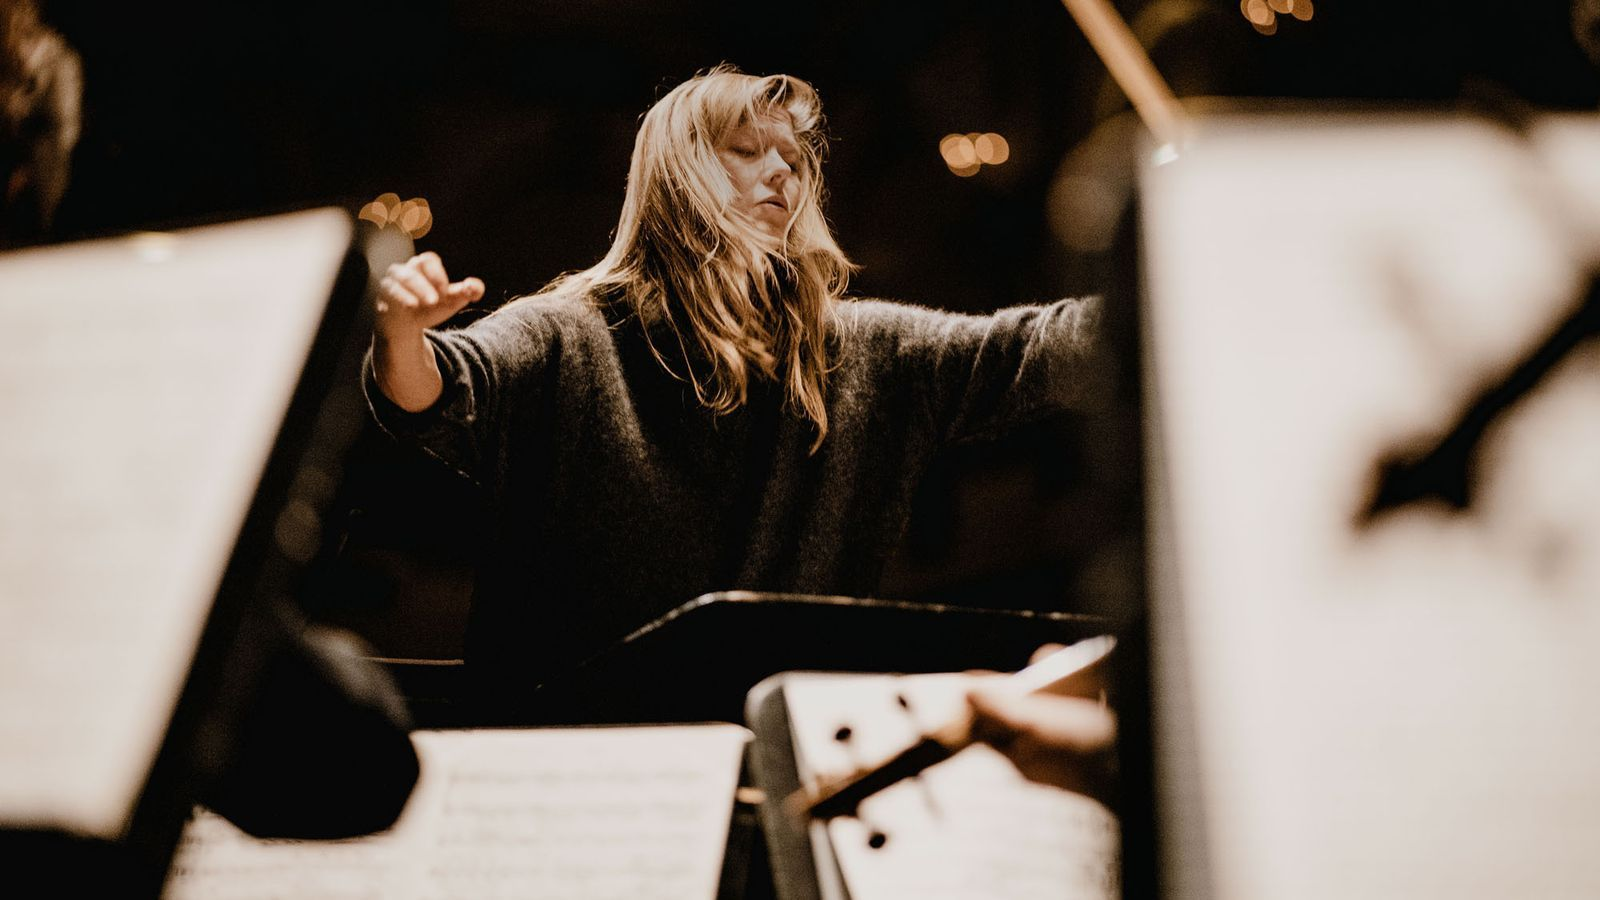 La directora i soprano Barbara Hannigan durant un concert